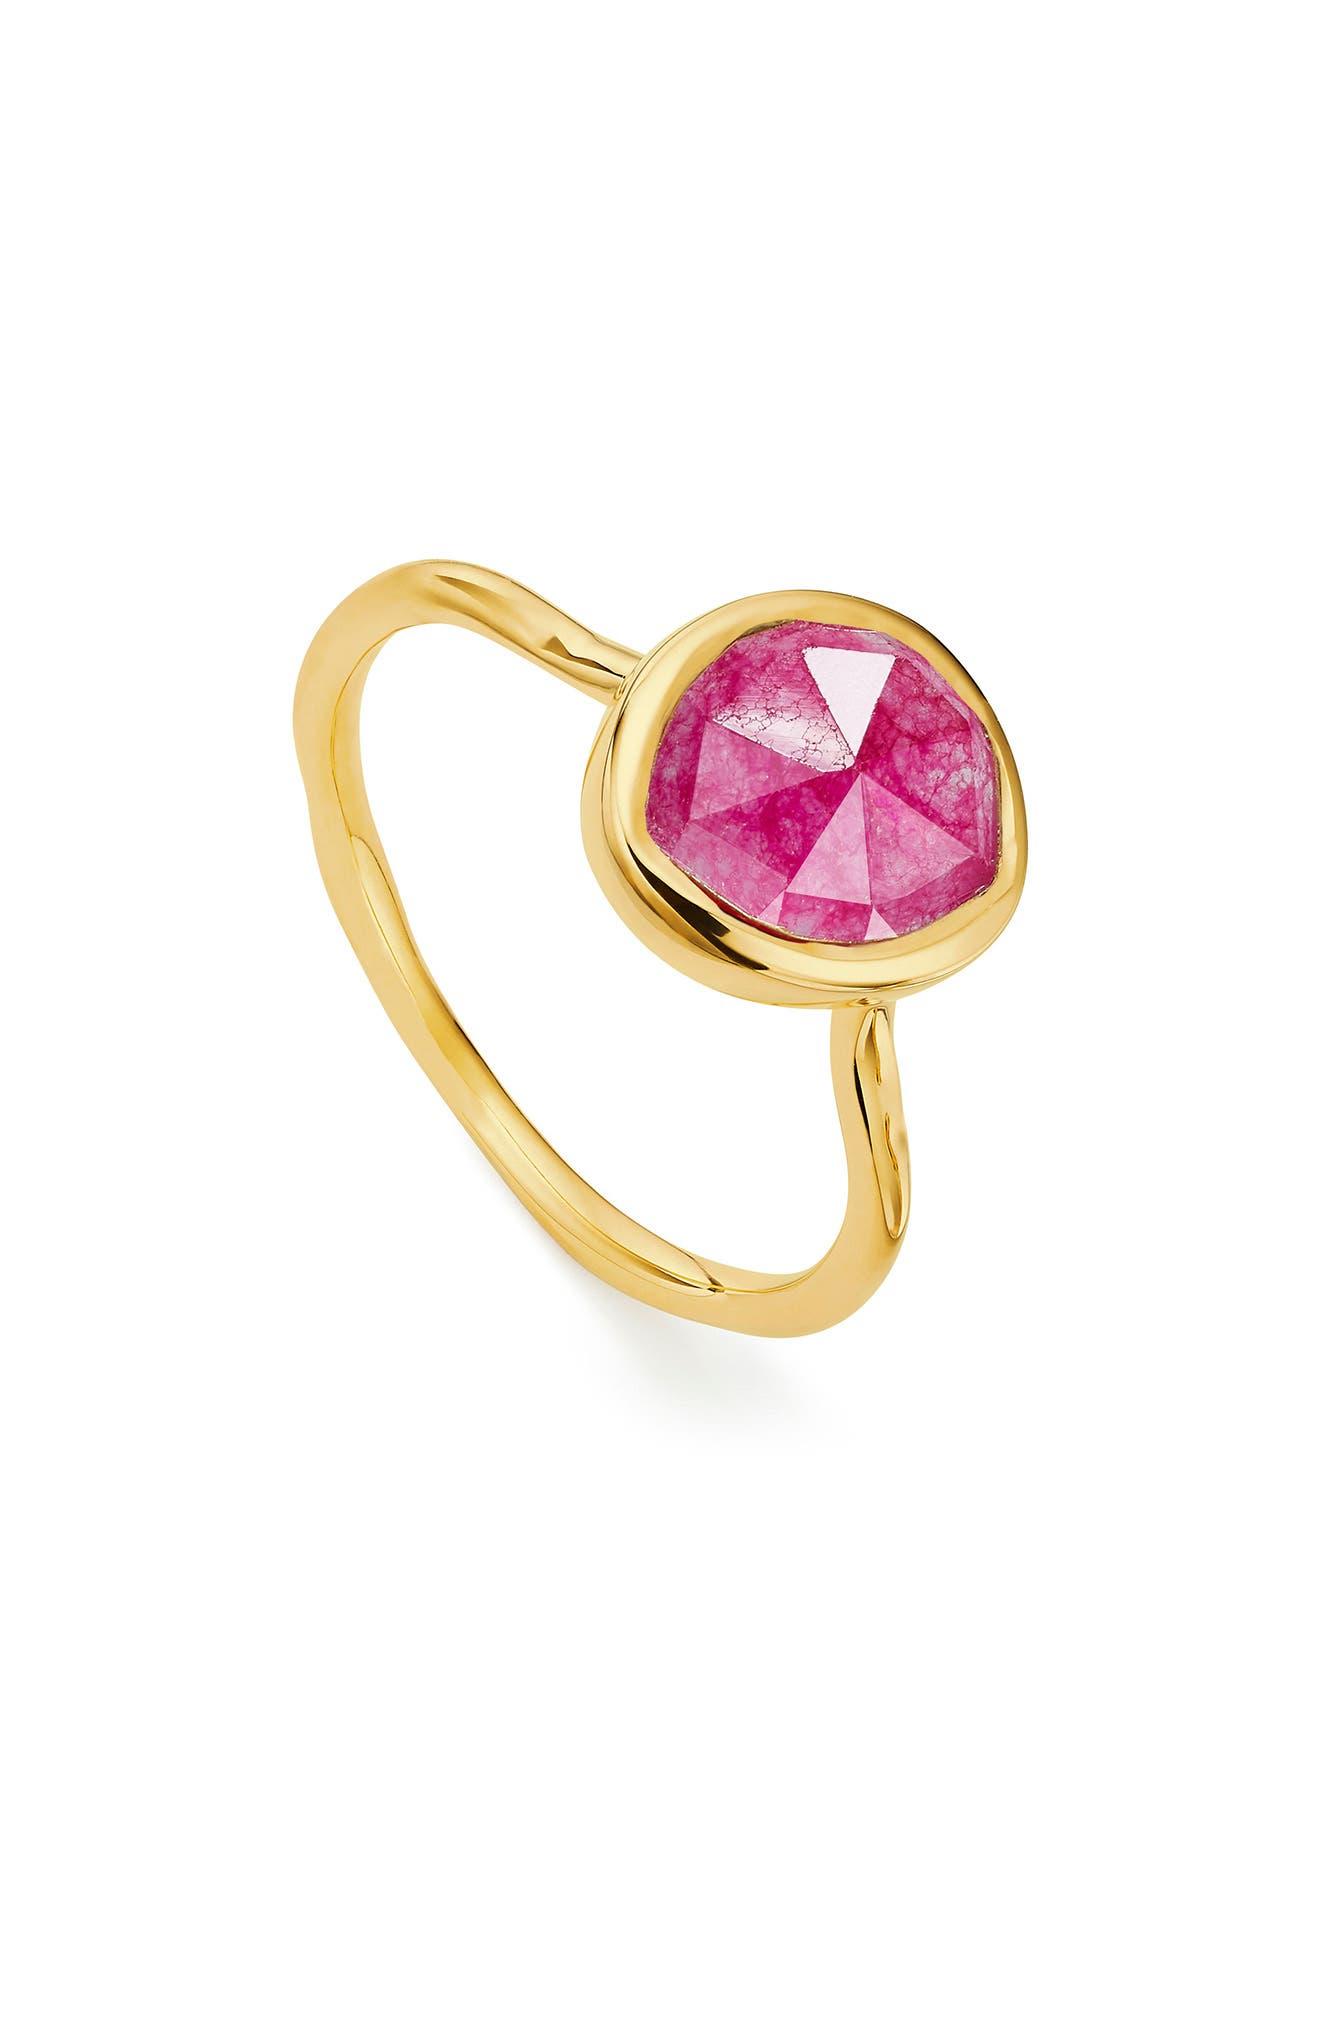 MONICA VINADER Siren Semiprecious Stone Stacking Ring, Main, color, GOLD/ PINK QUARTZ